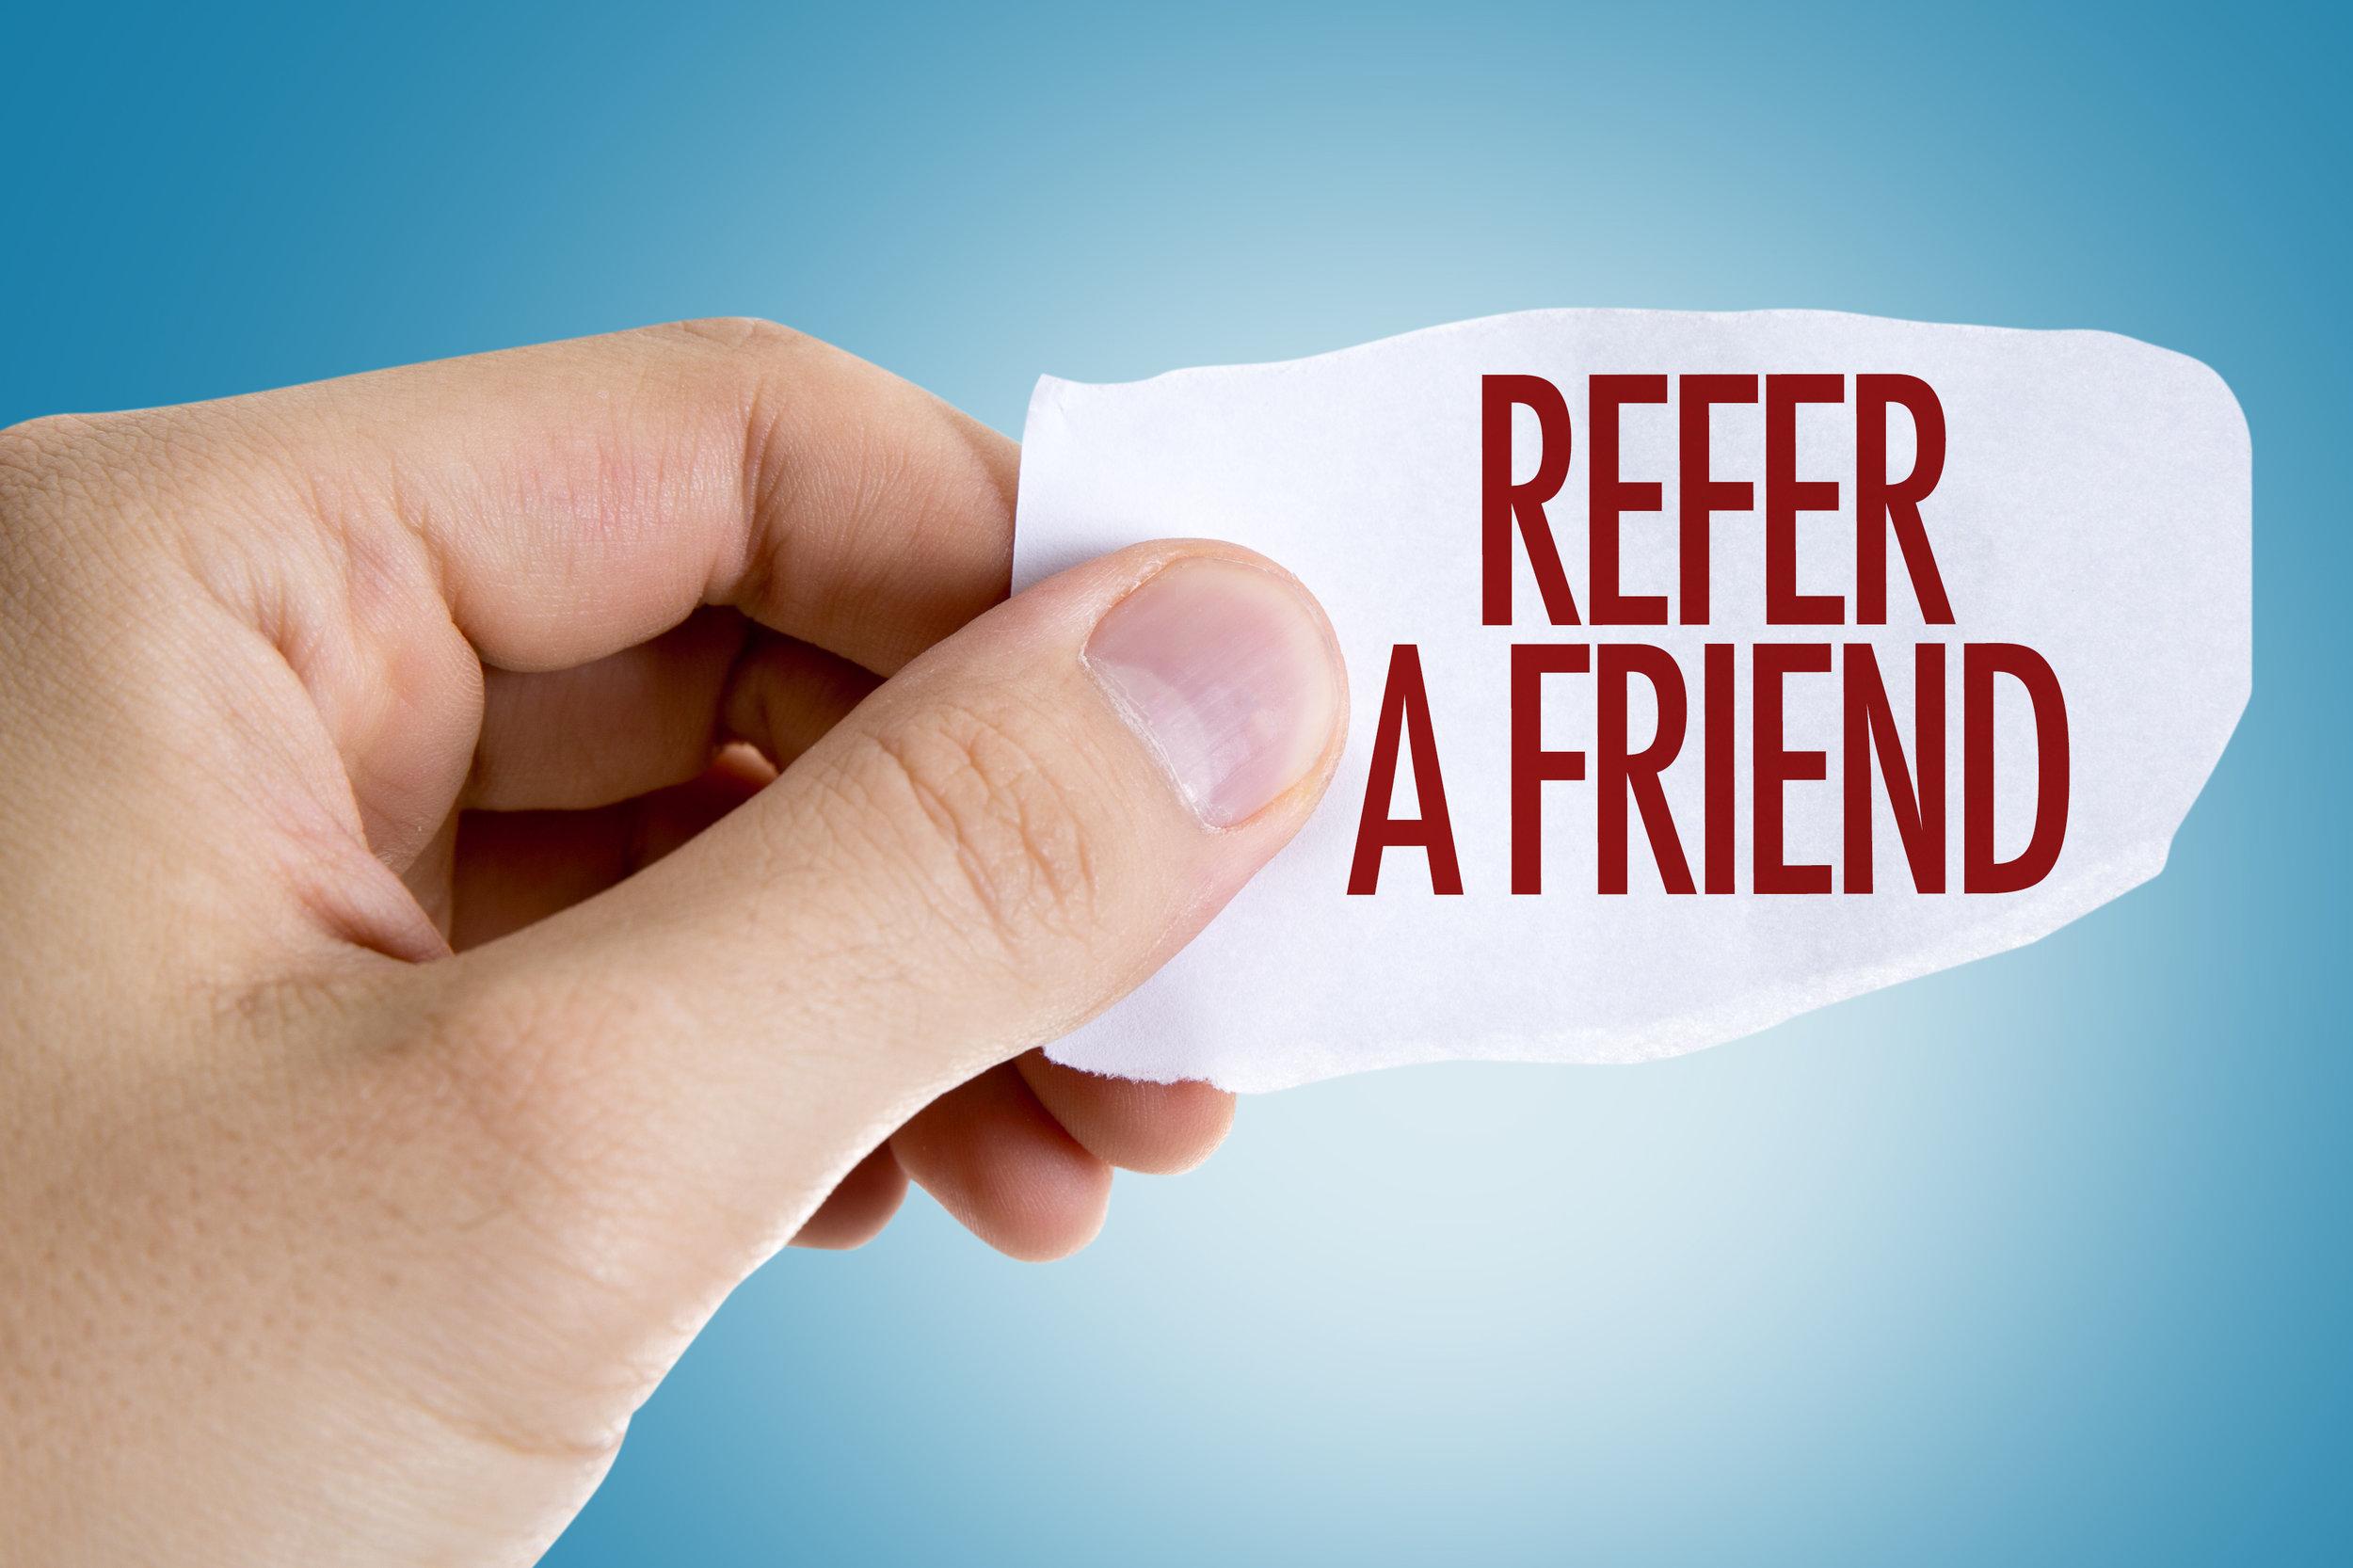 Referral-program-gain-clients.jpg